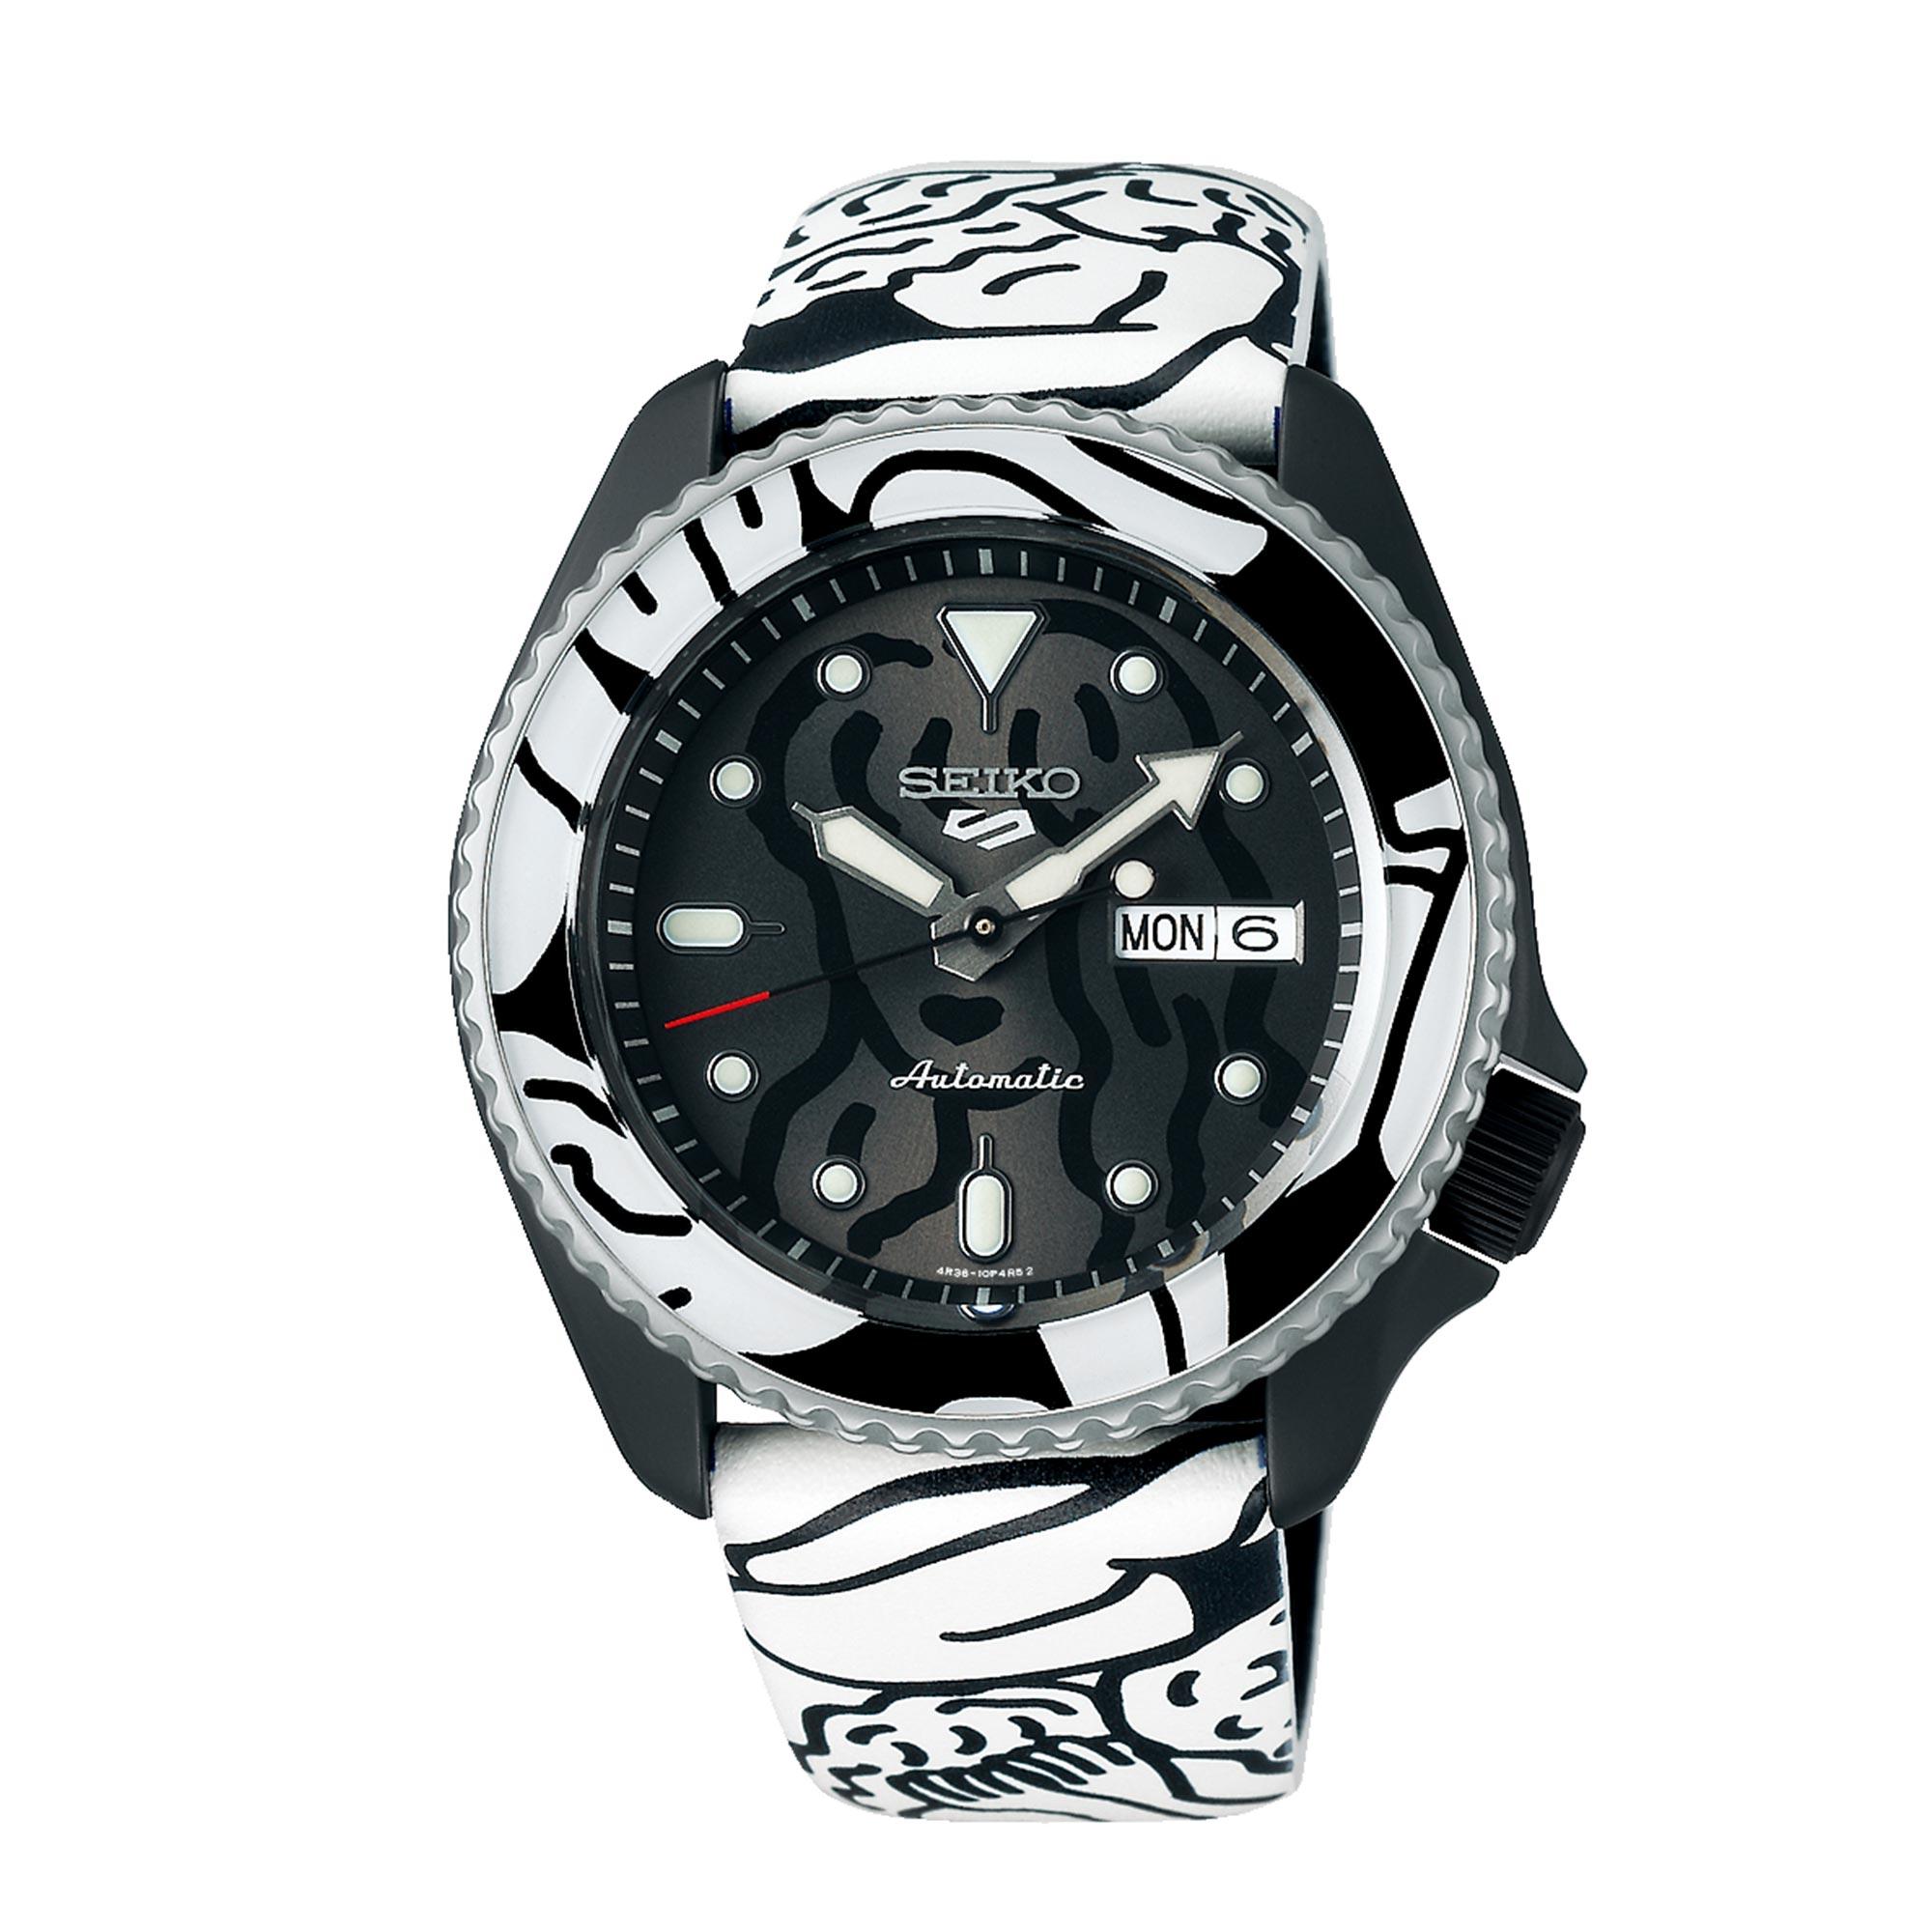 Seiko 5 Sports Automatic Movement Black Dial Leather Bracelet Men's Watch SRPG43K1